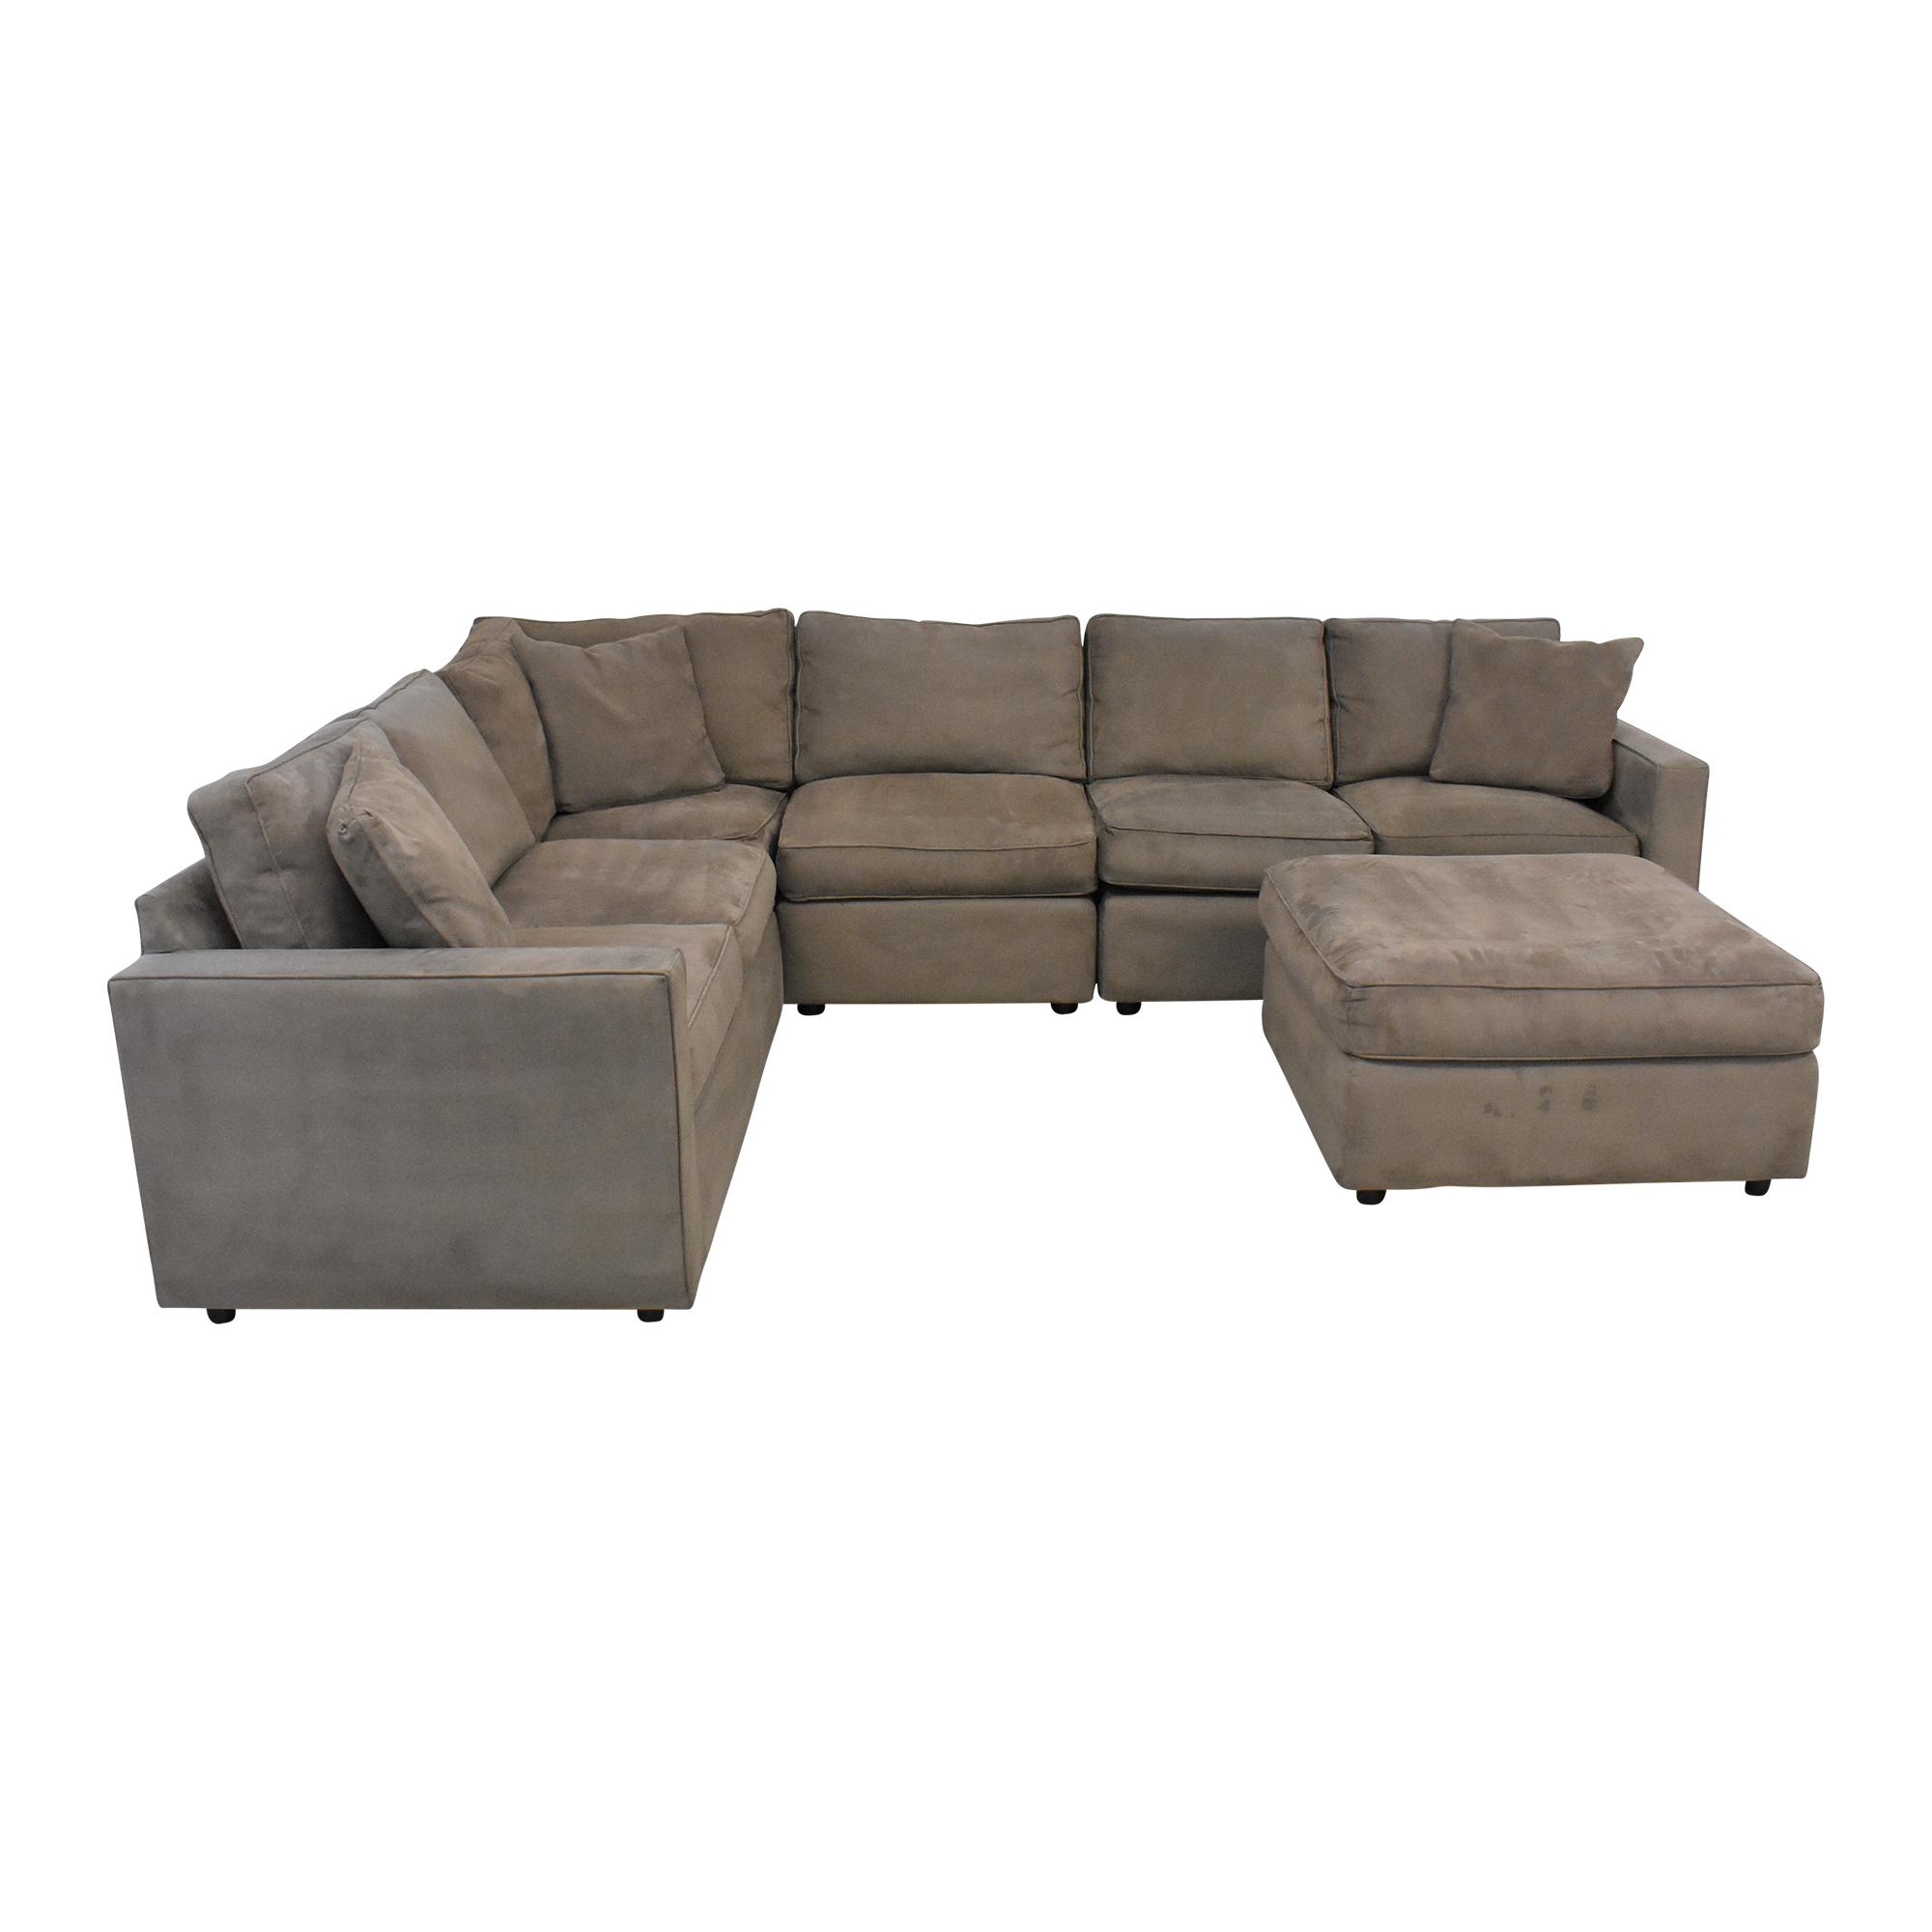 Room & Board Room & Board York Sectional Sofa with Ottoman brown